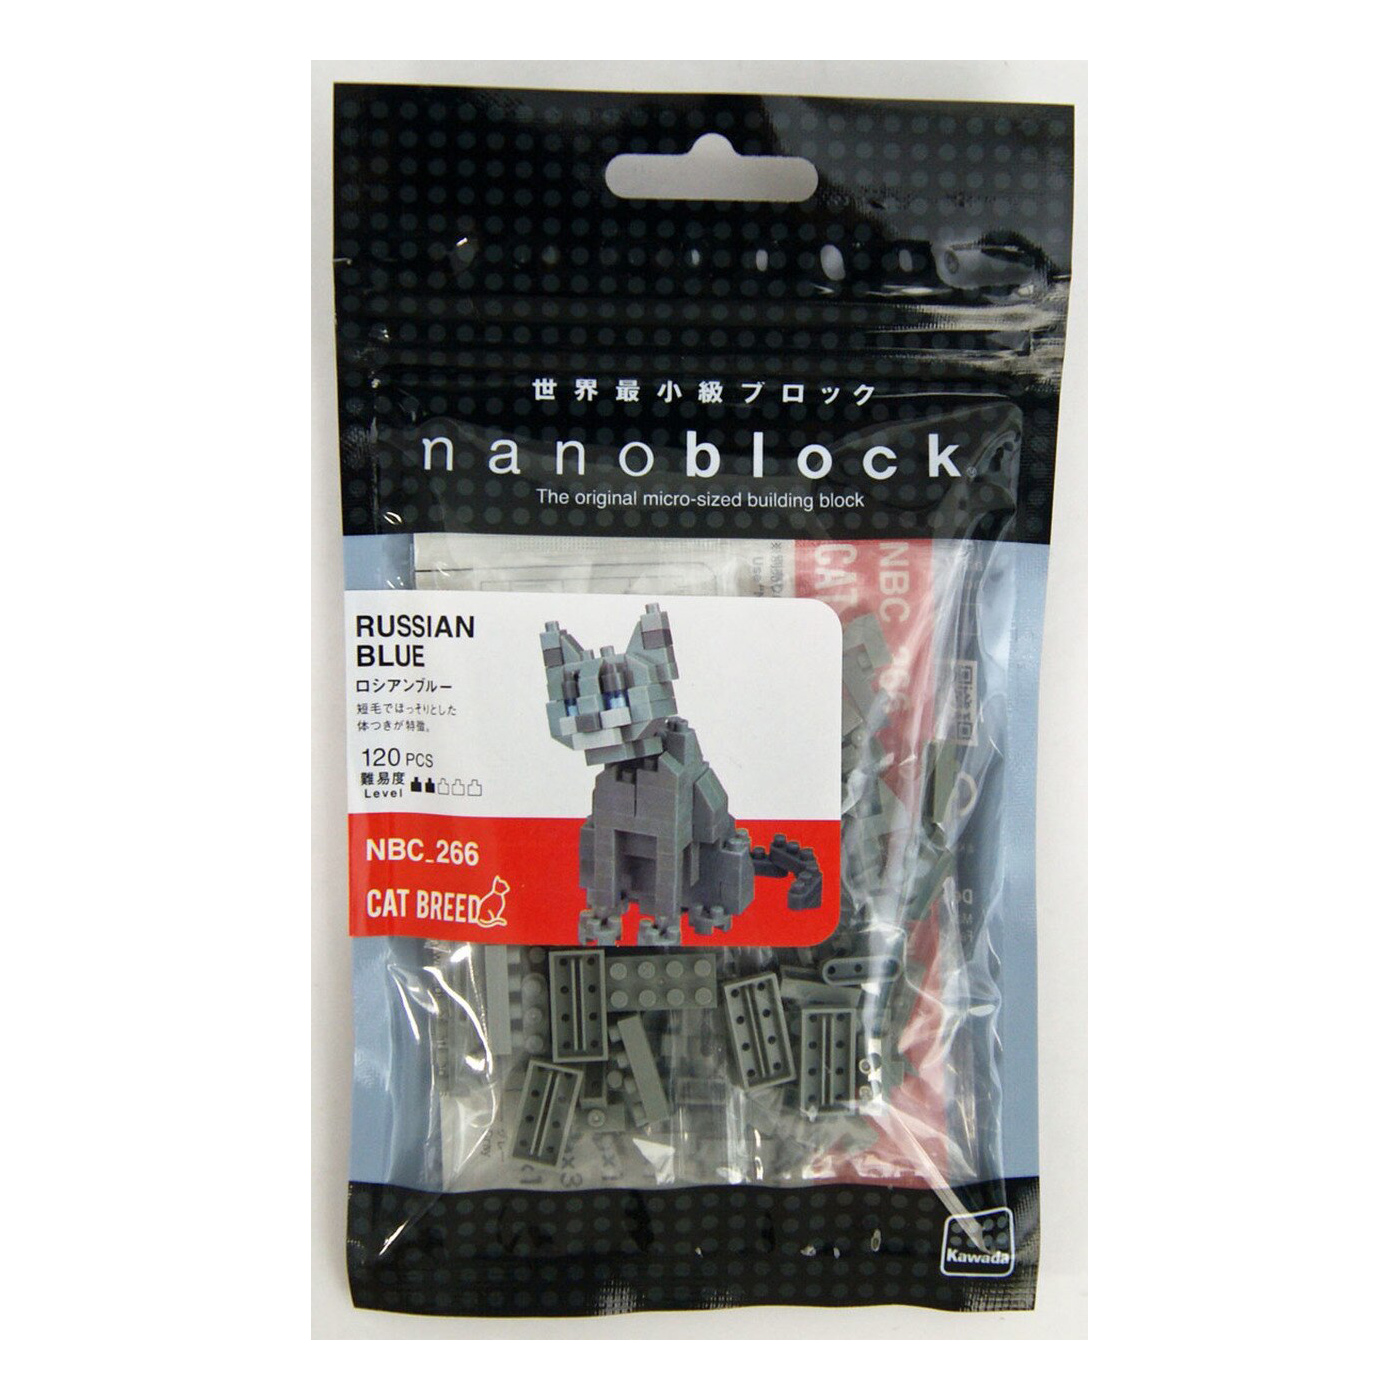 Russian Blue - Nanoblock